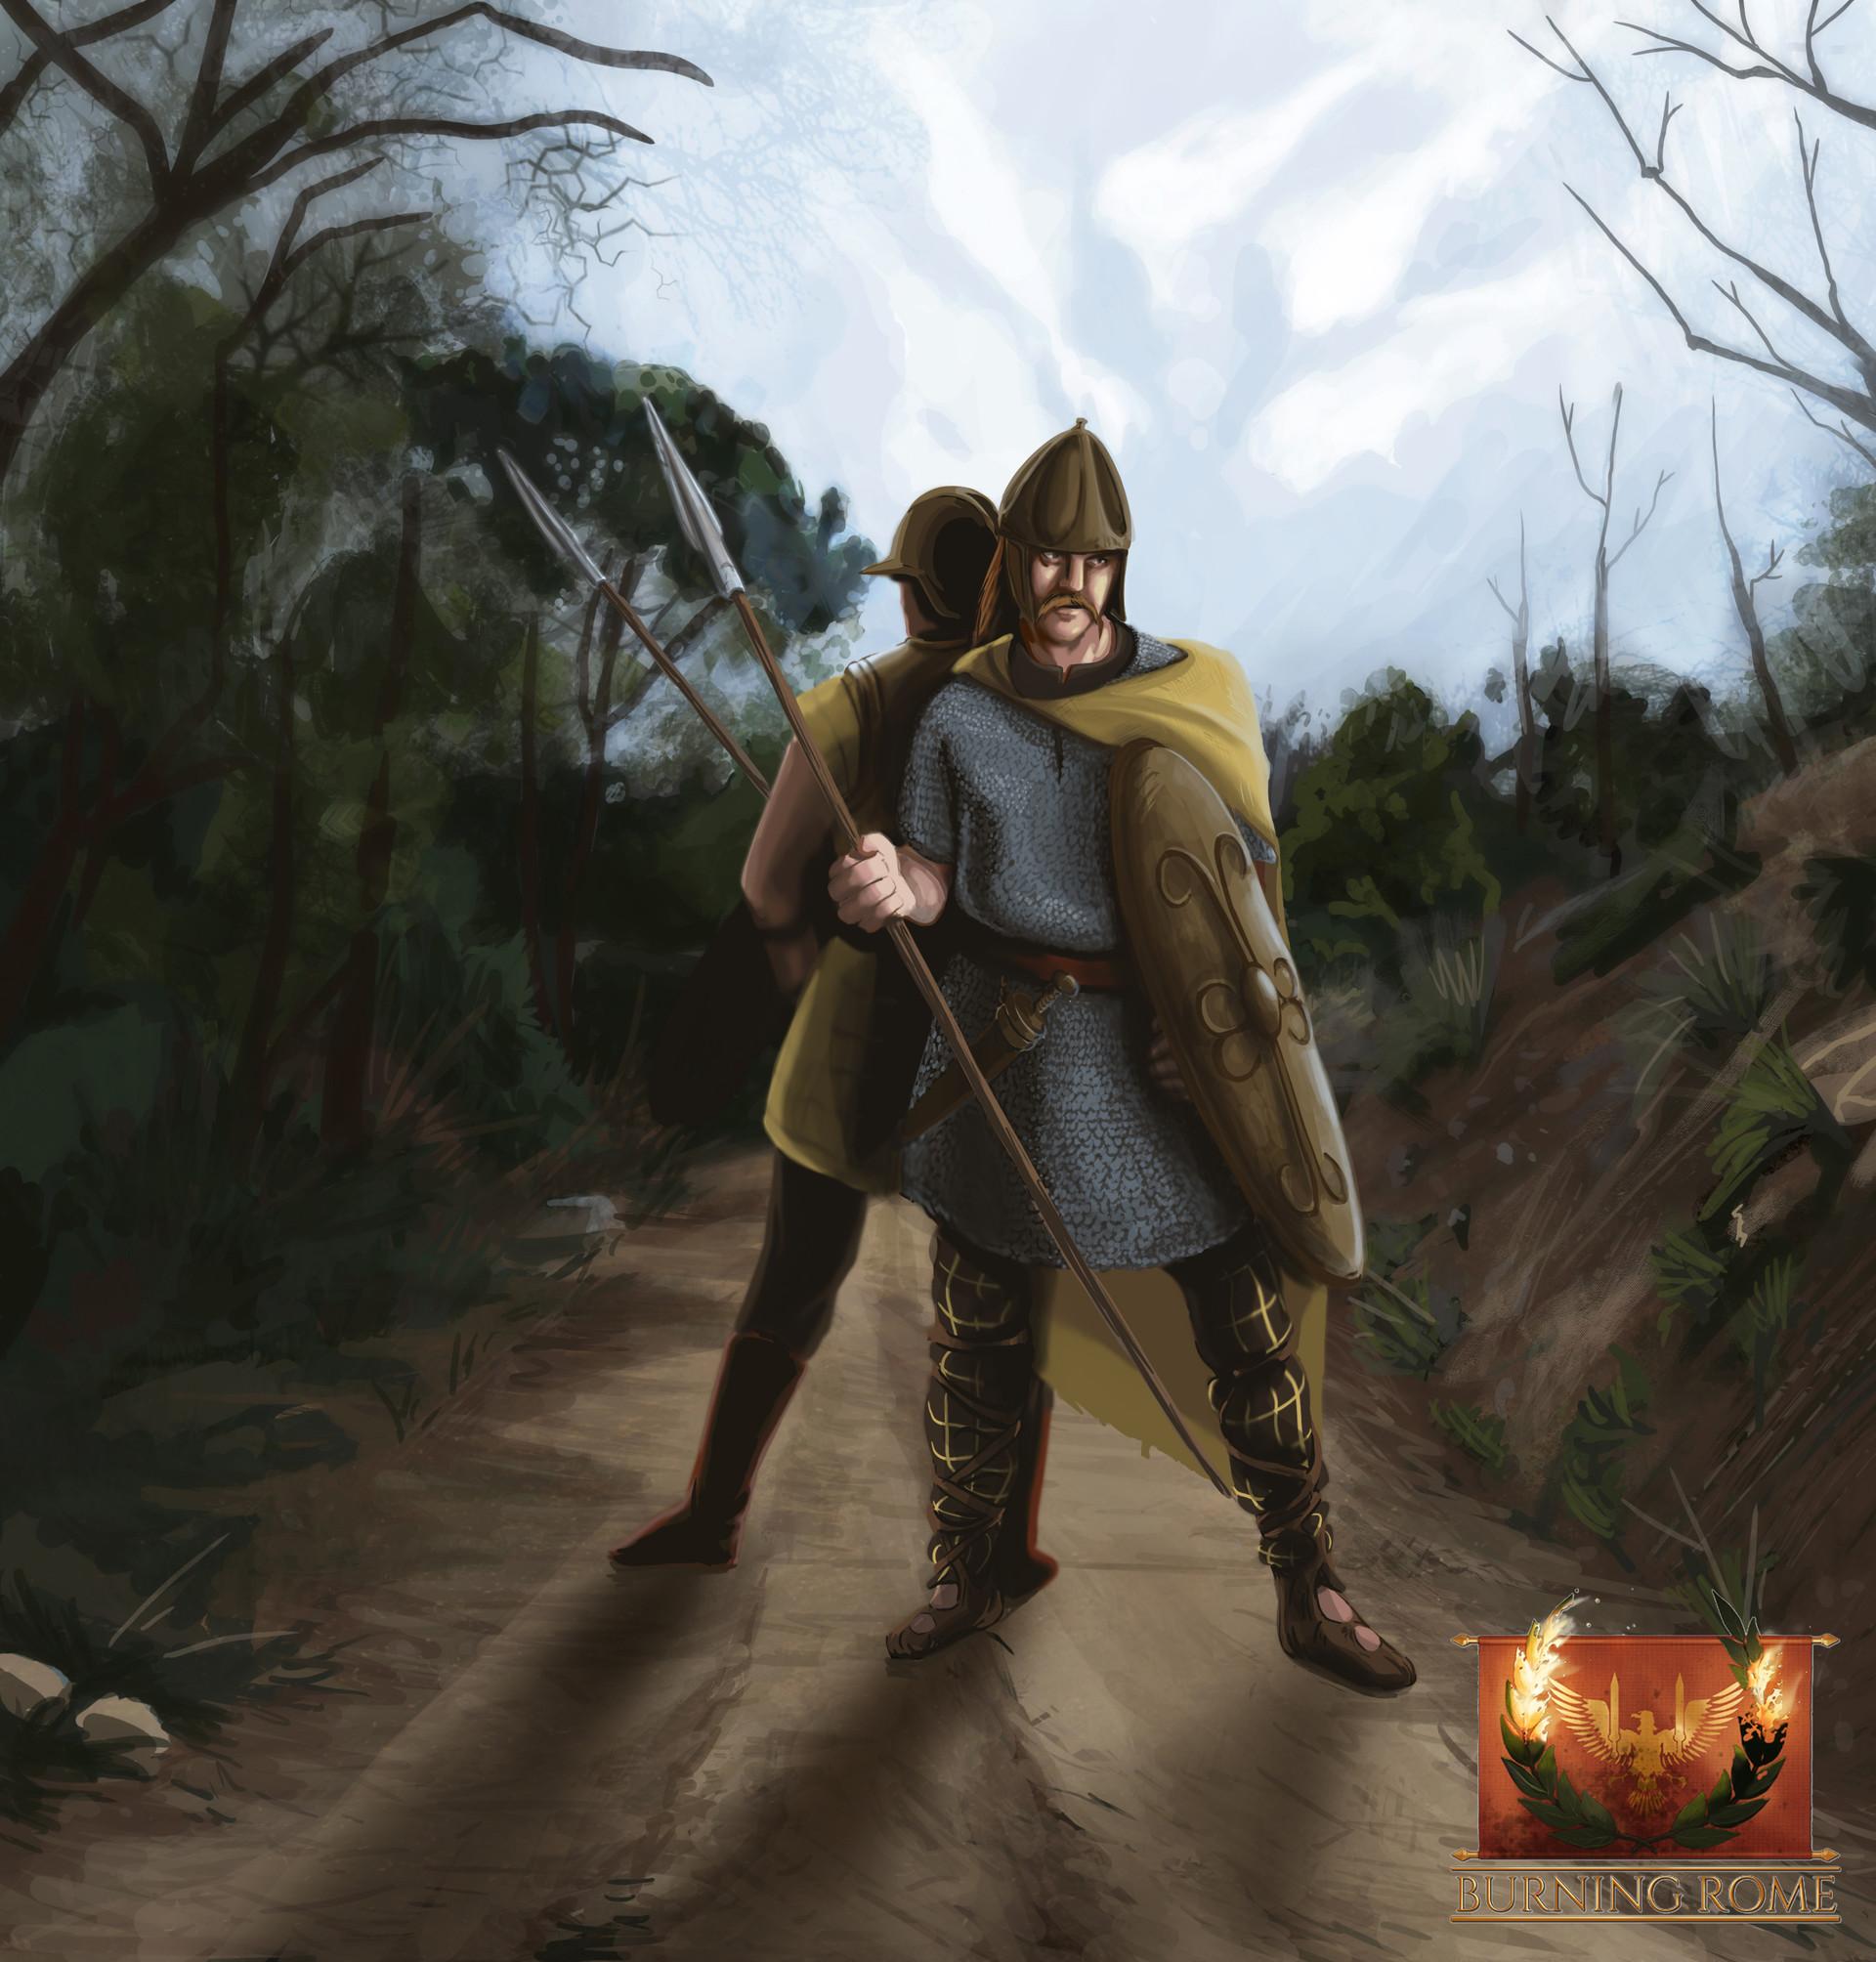 Saida granero parra 009 spear brothers